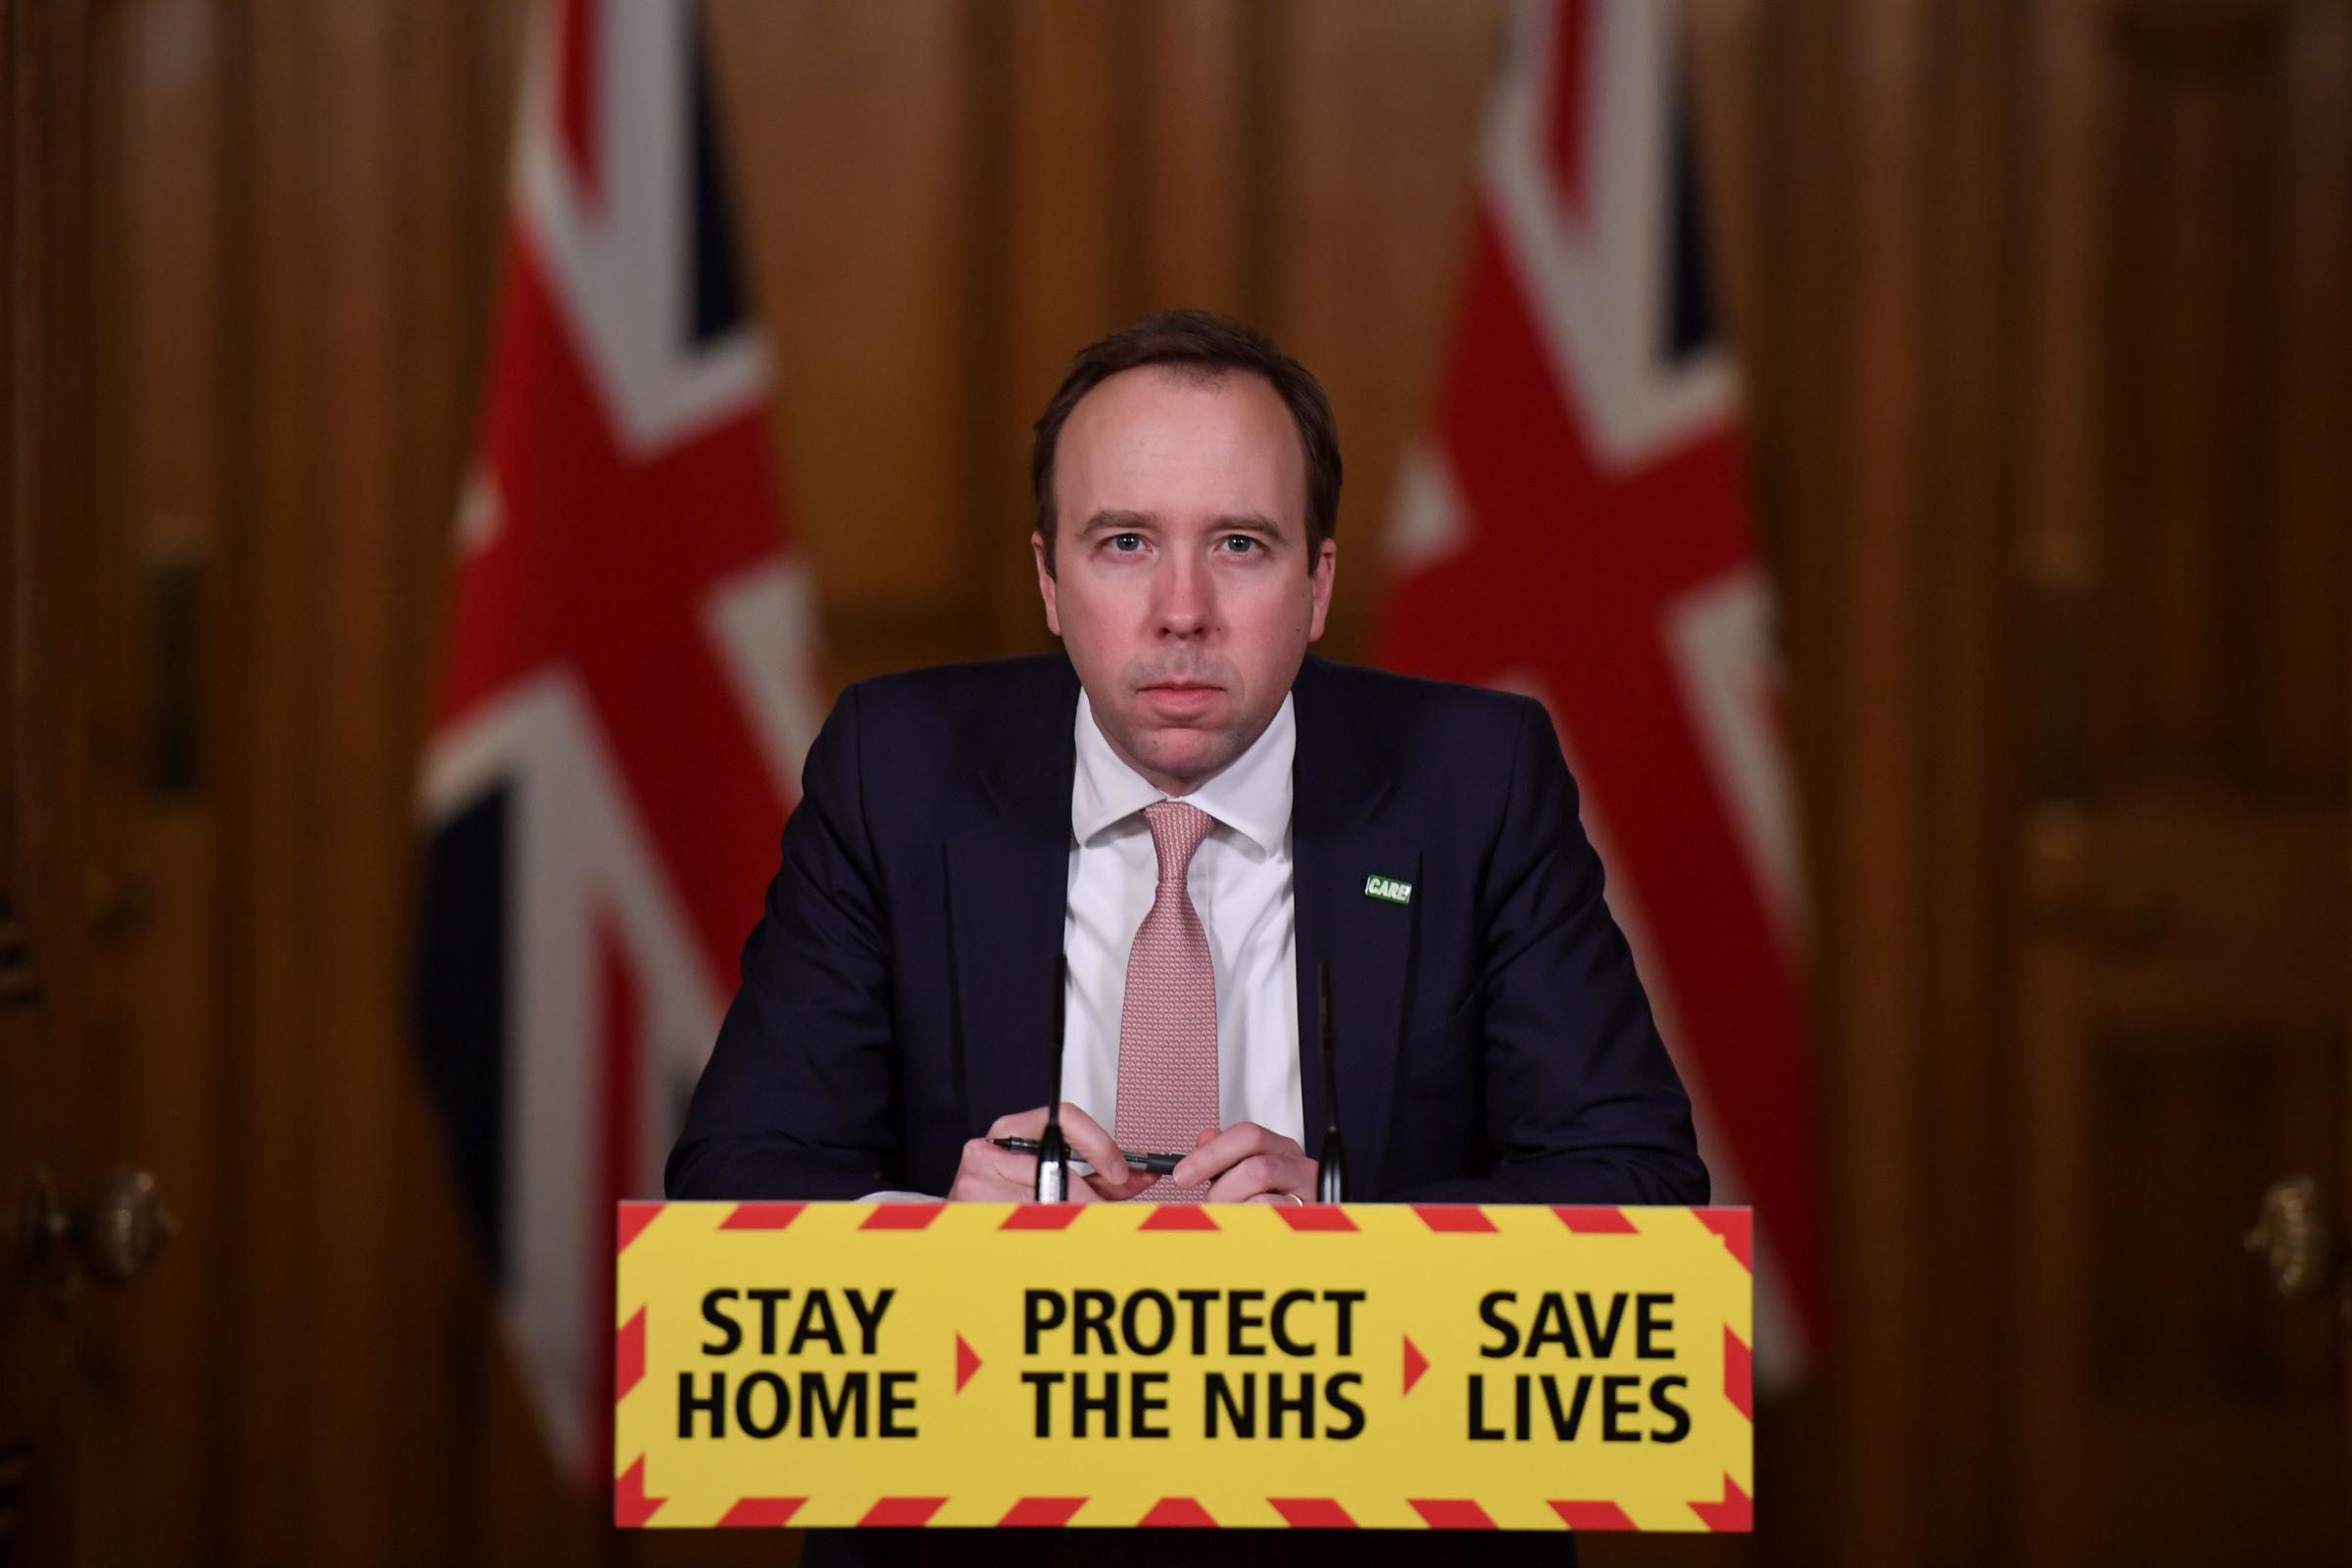 Health Secretary Matt Hancock during a media briefing in Downing Street, London, on coronavirus (Covid-19). Picture date: Monday February 1, 2021..